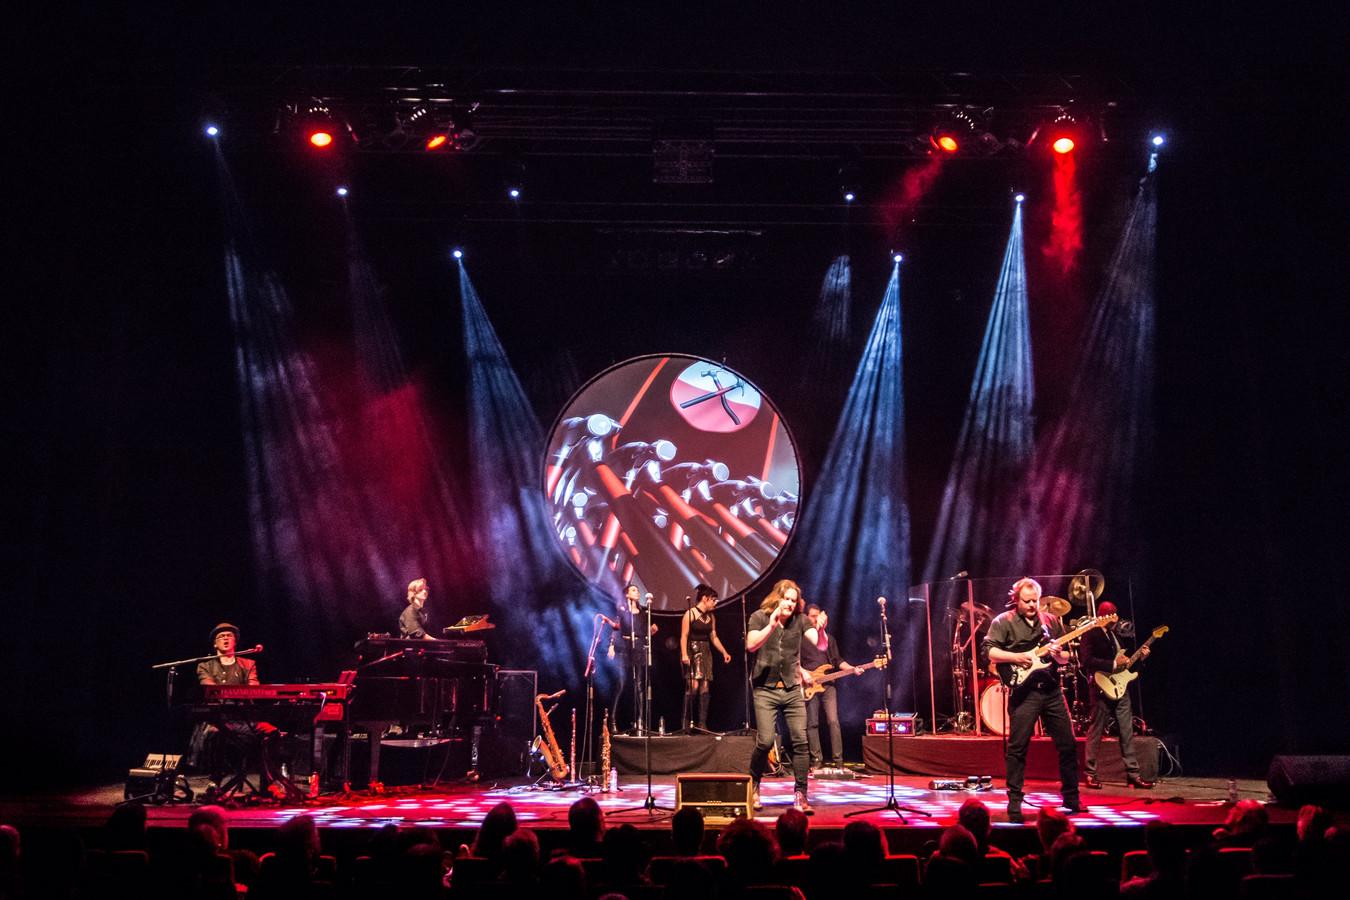 Delftse band Symphonic Rock Night tijdens liveshow.